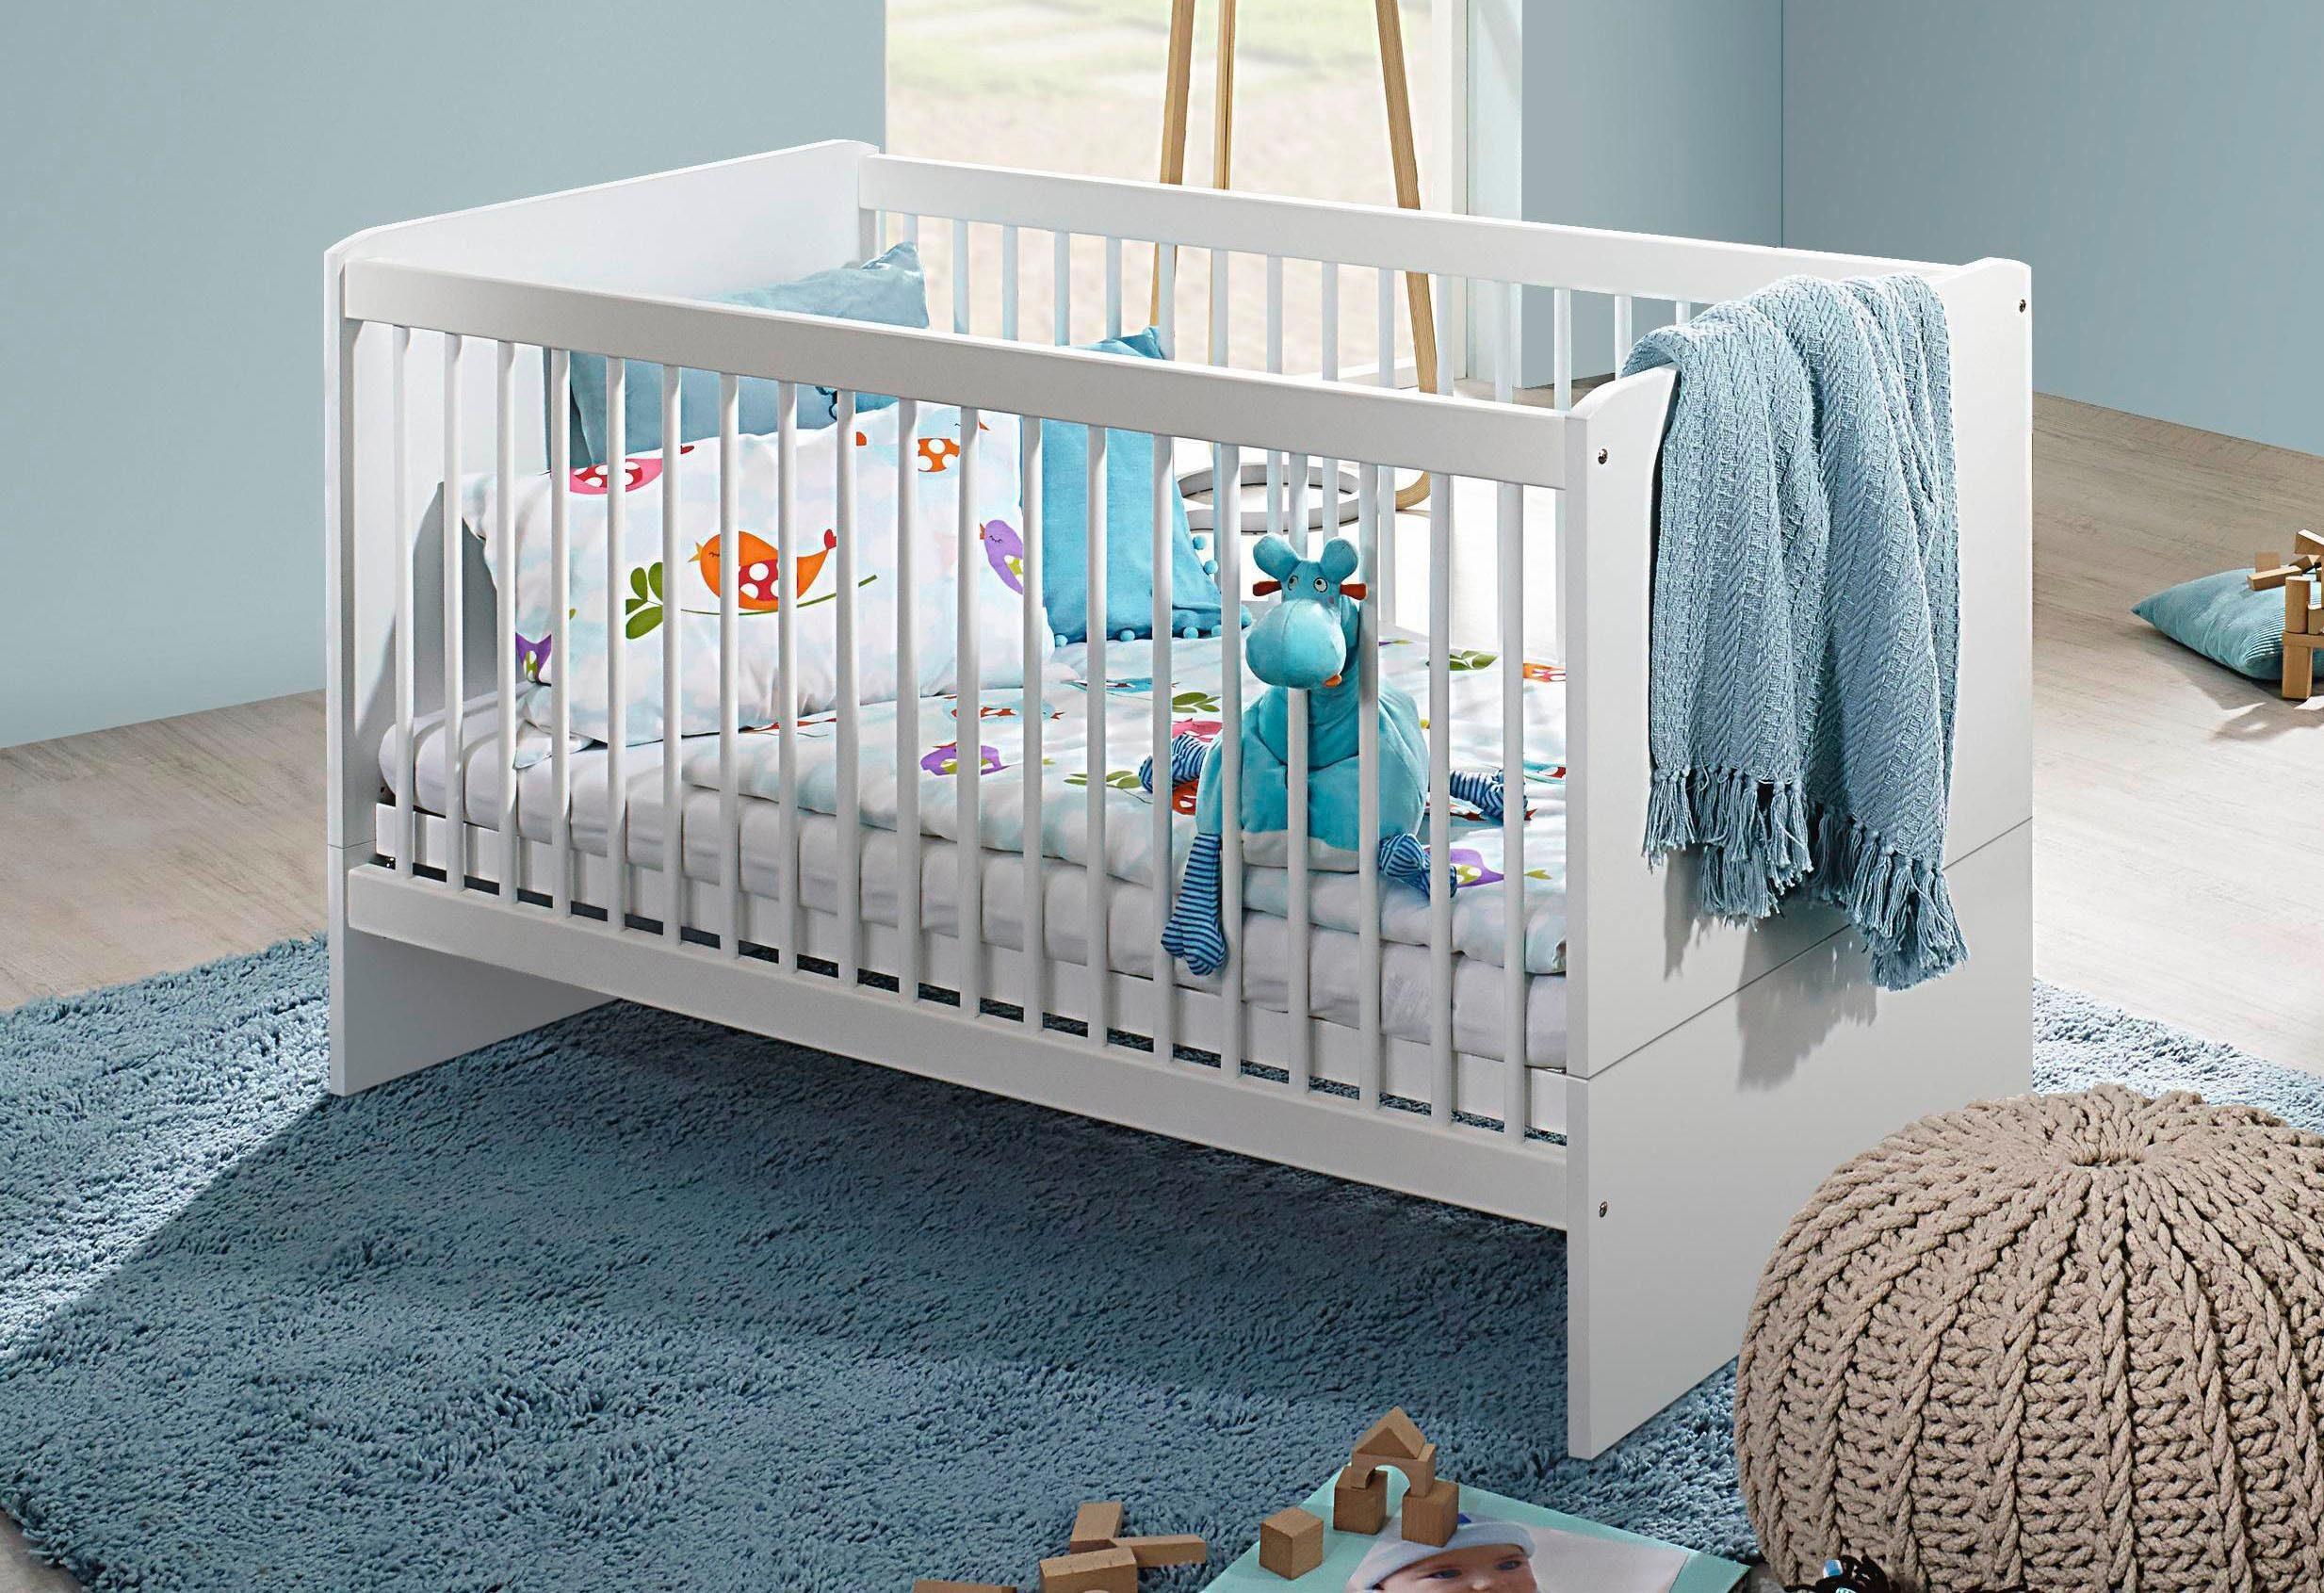 Babykamer Miami Kinderkamer : Babykamer potsdam wit online shop nu online kopen otto